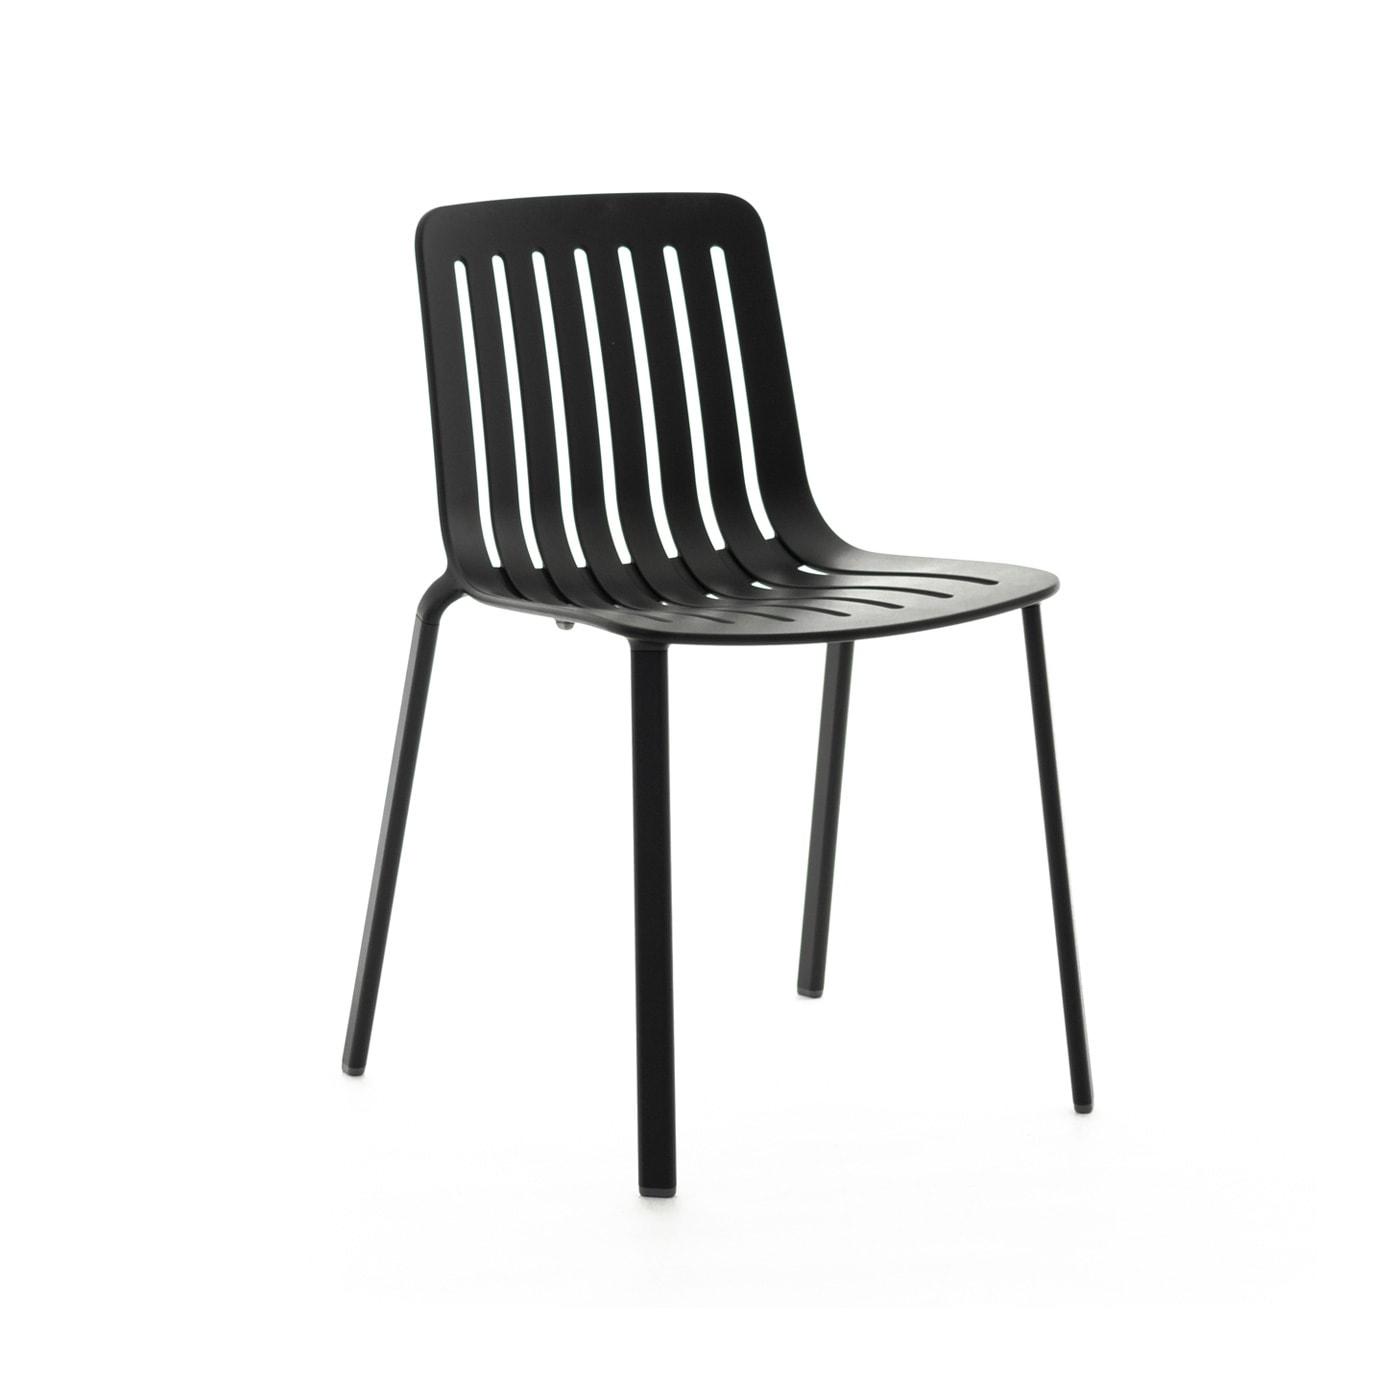 MAGIS Plato sedia alluminio impilabile